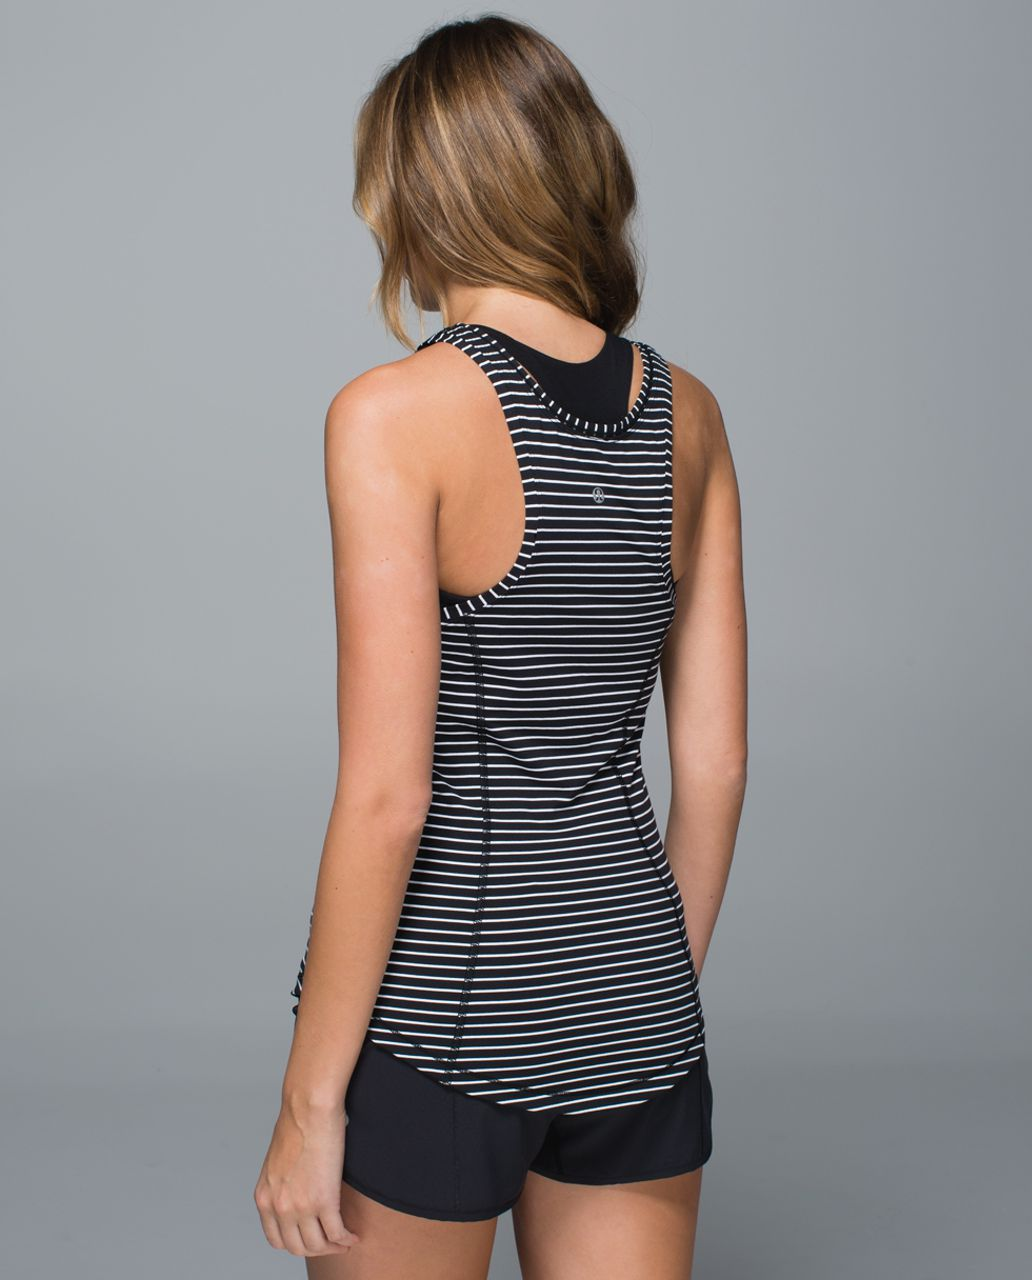 Lululemon Think Fast Tank - Parallel Stripe Black White